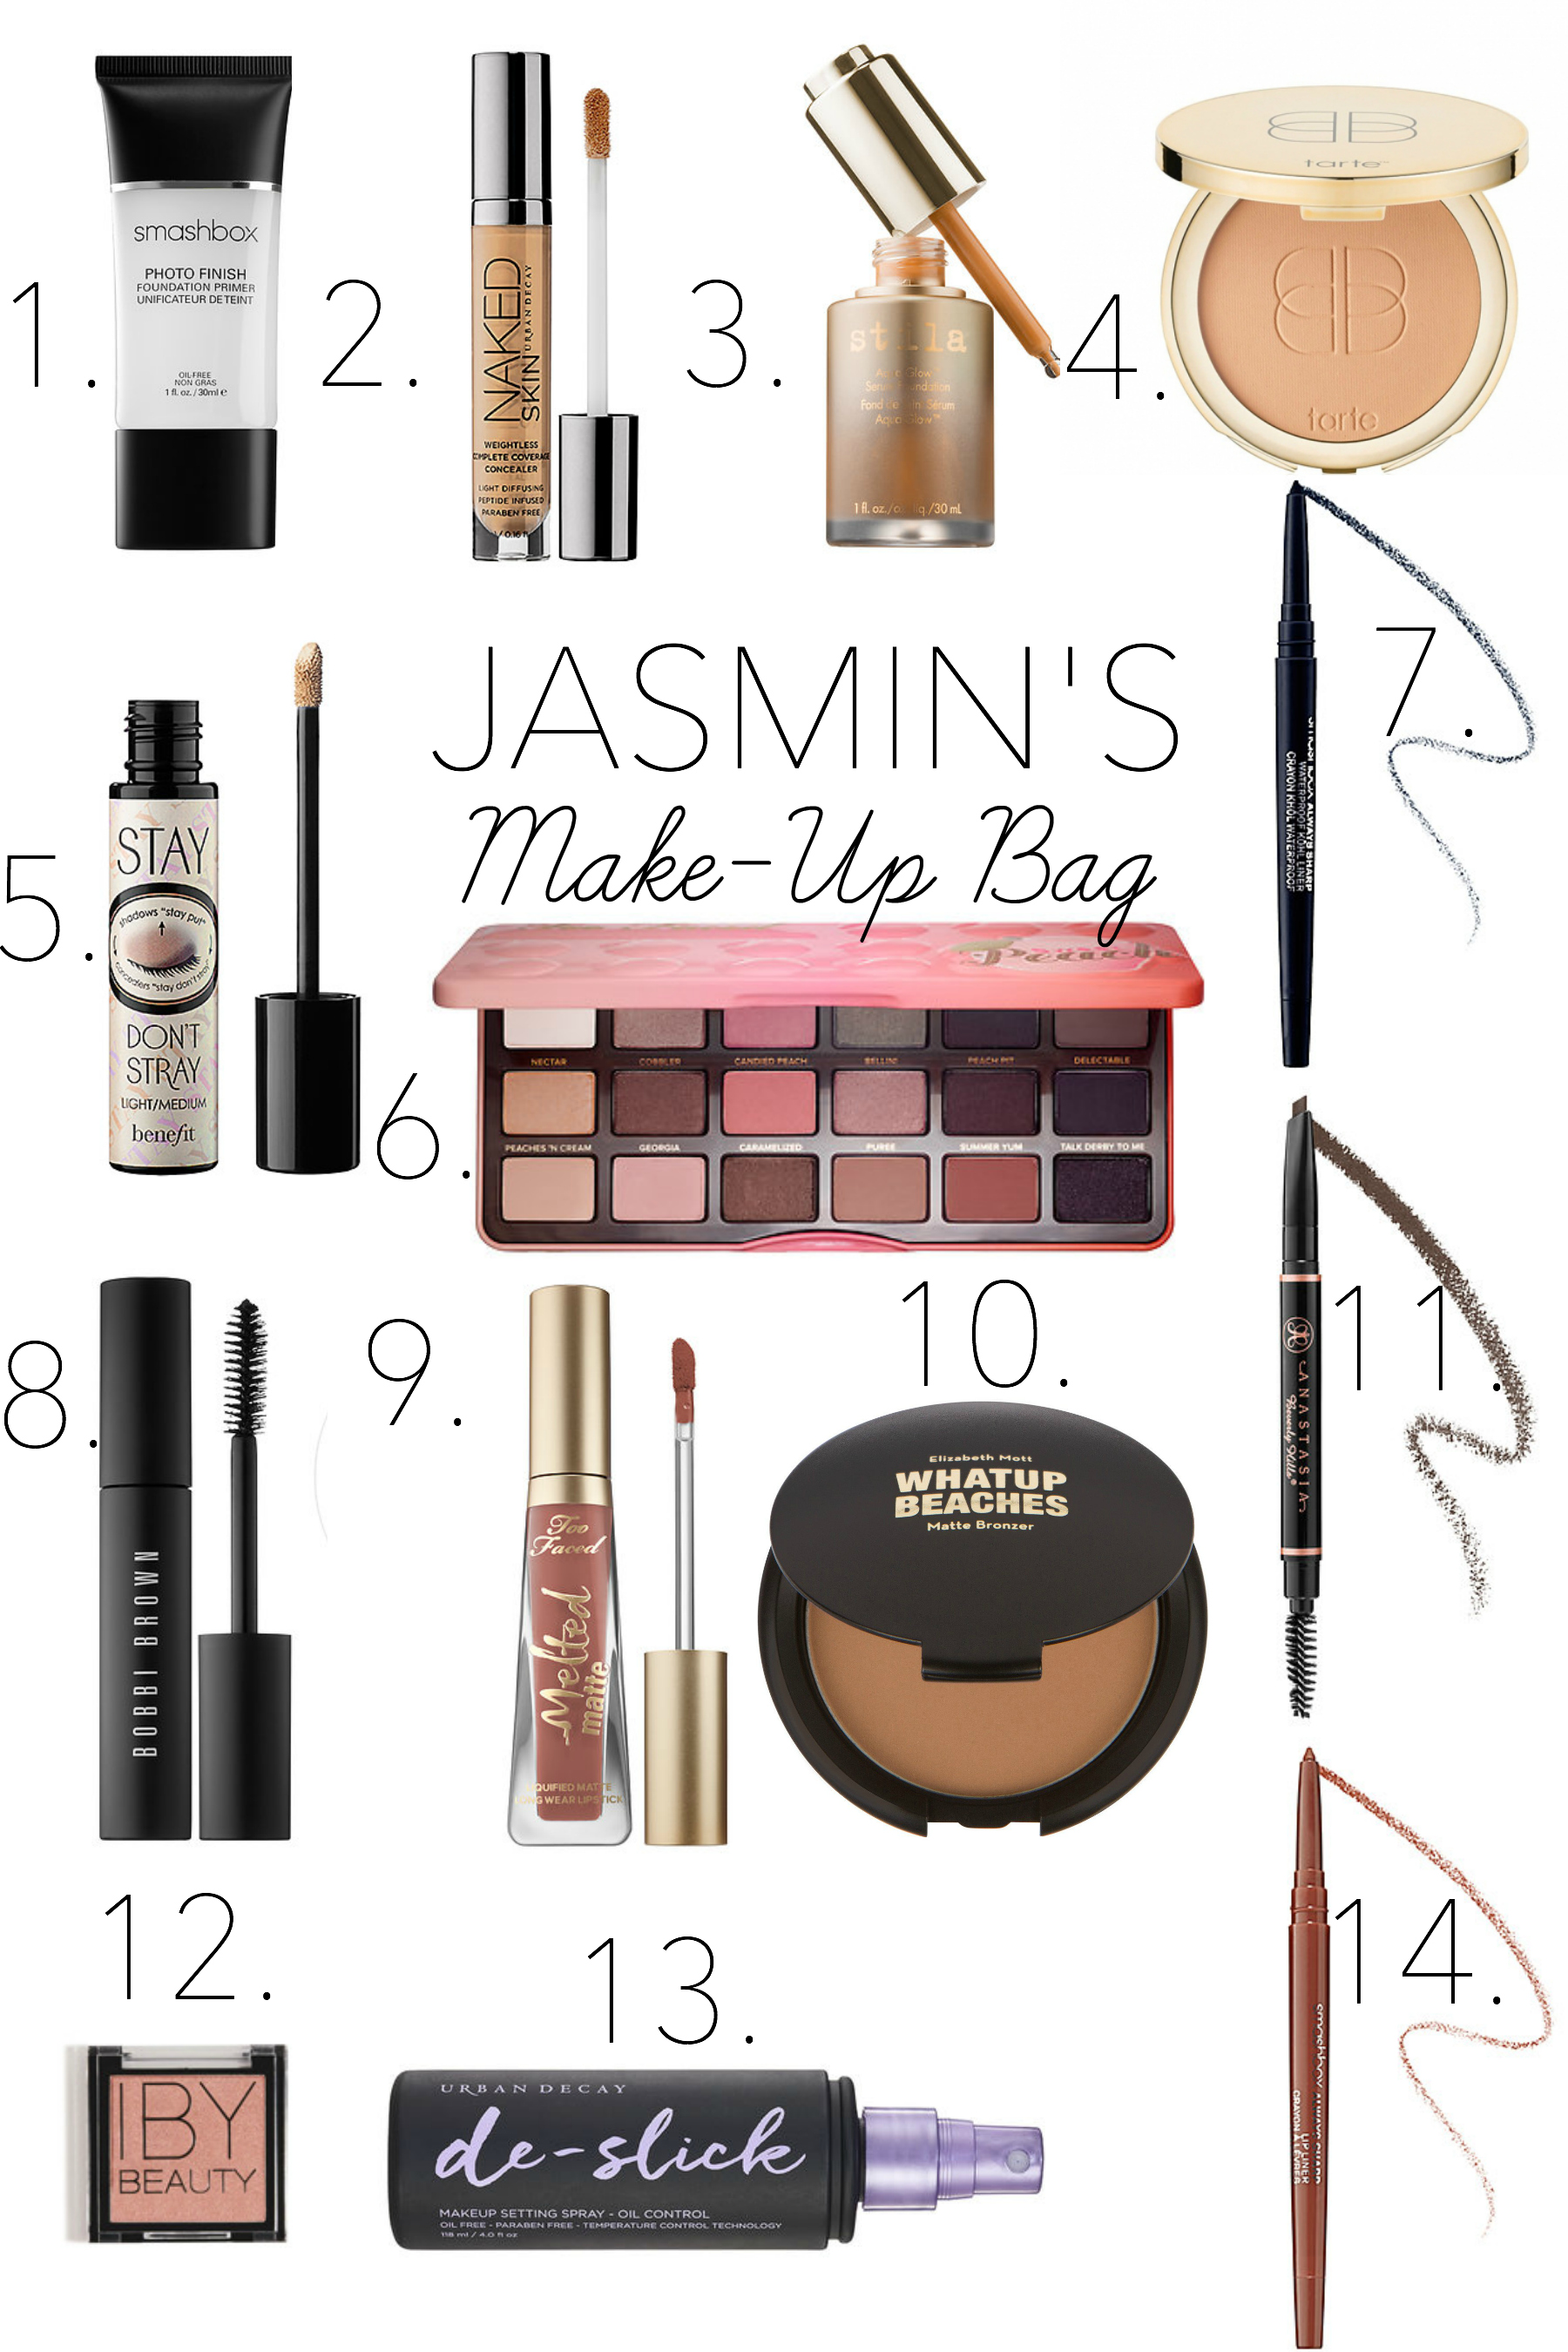 Make-Up Bag.jpg